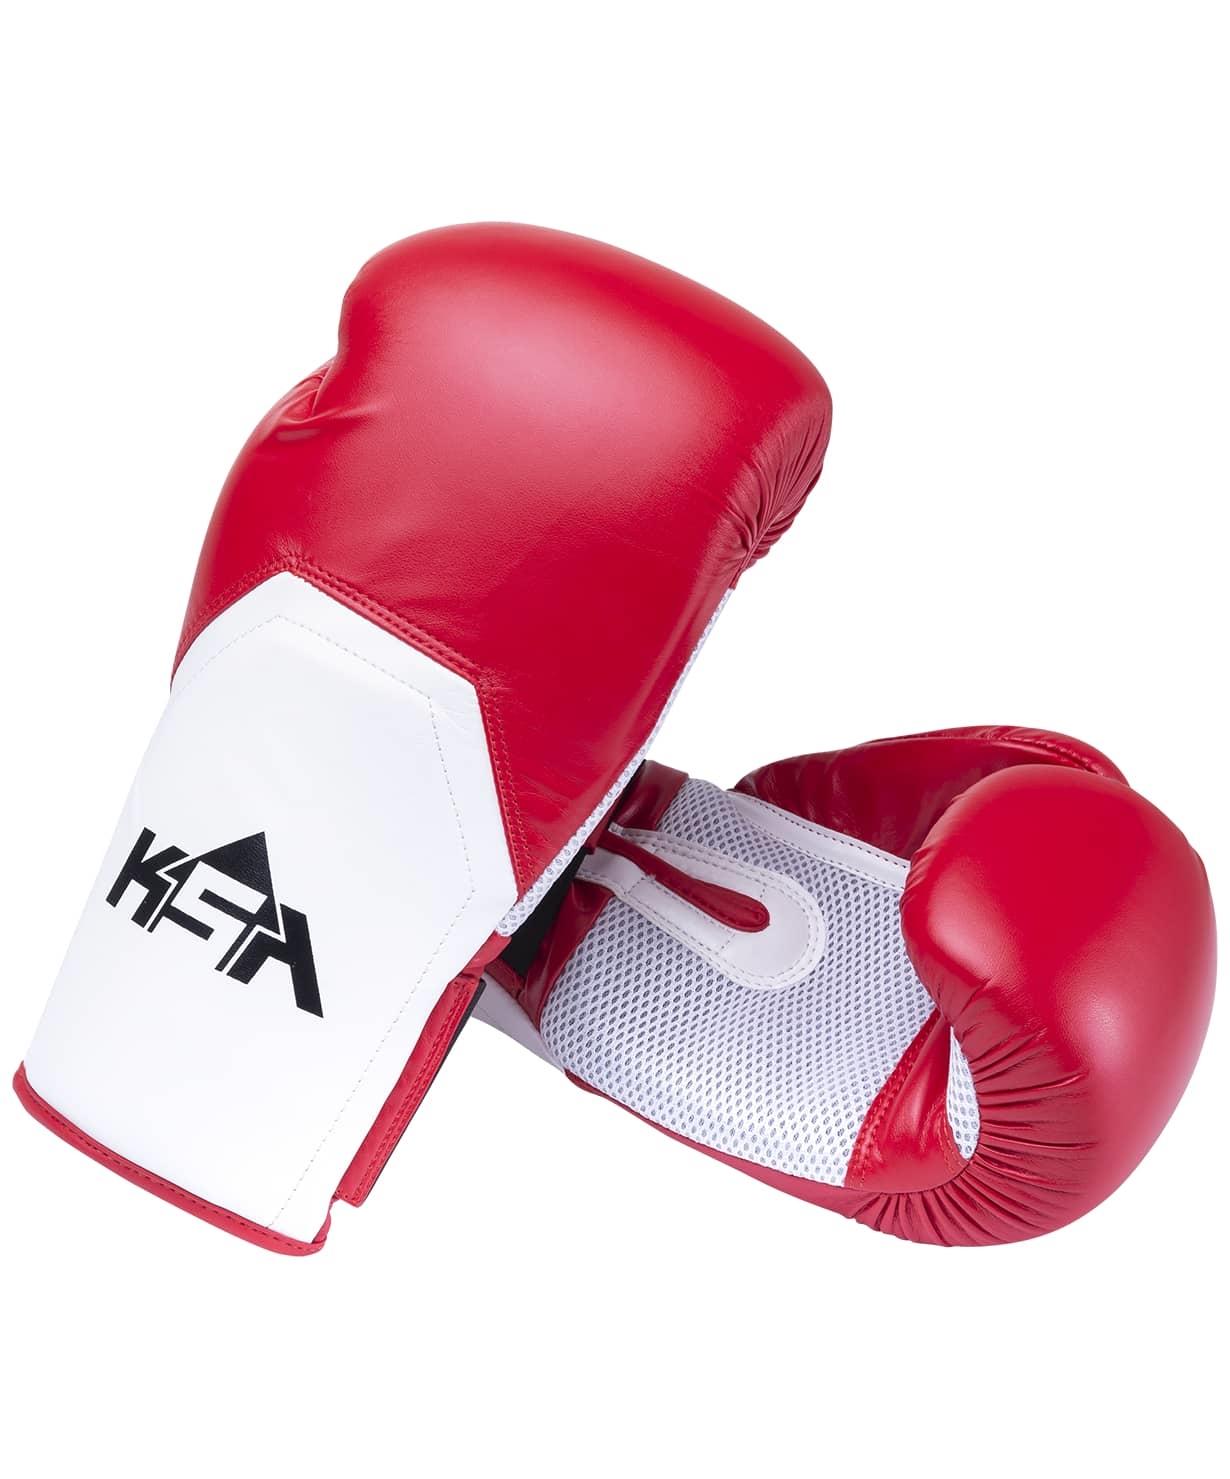 Перчатки боксерские Scorpio Red, к/з,  6 oz